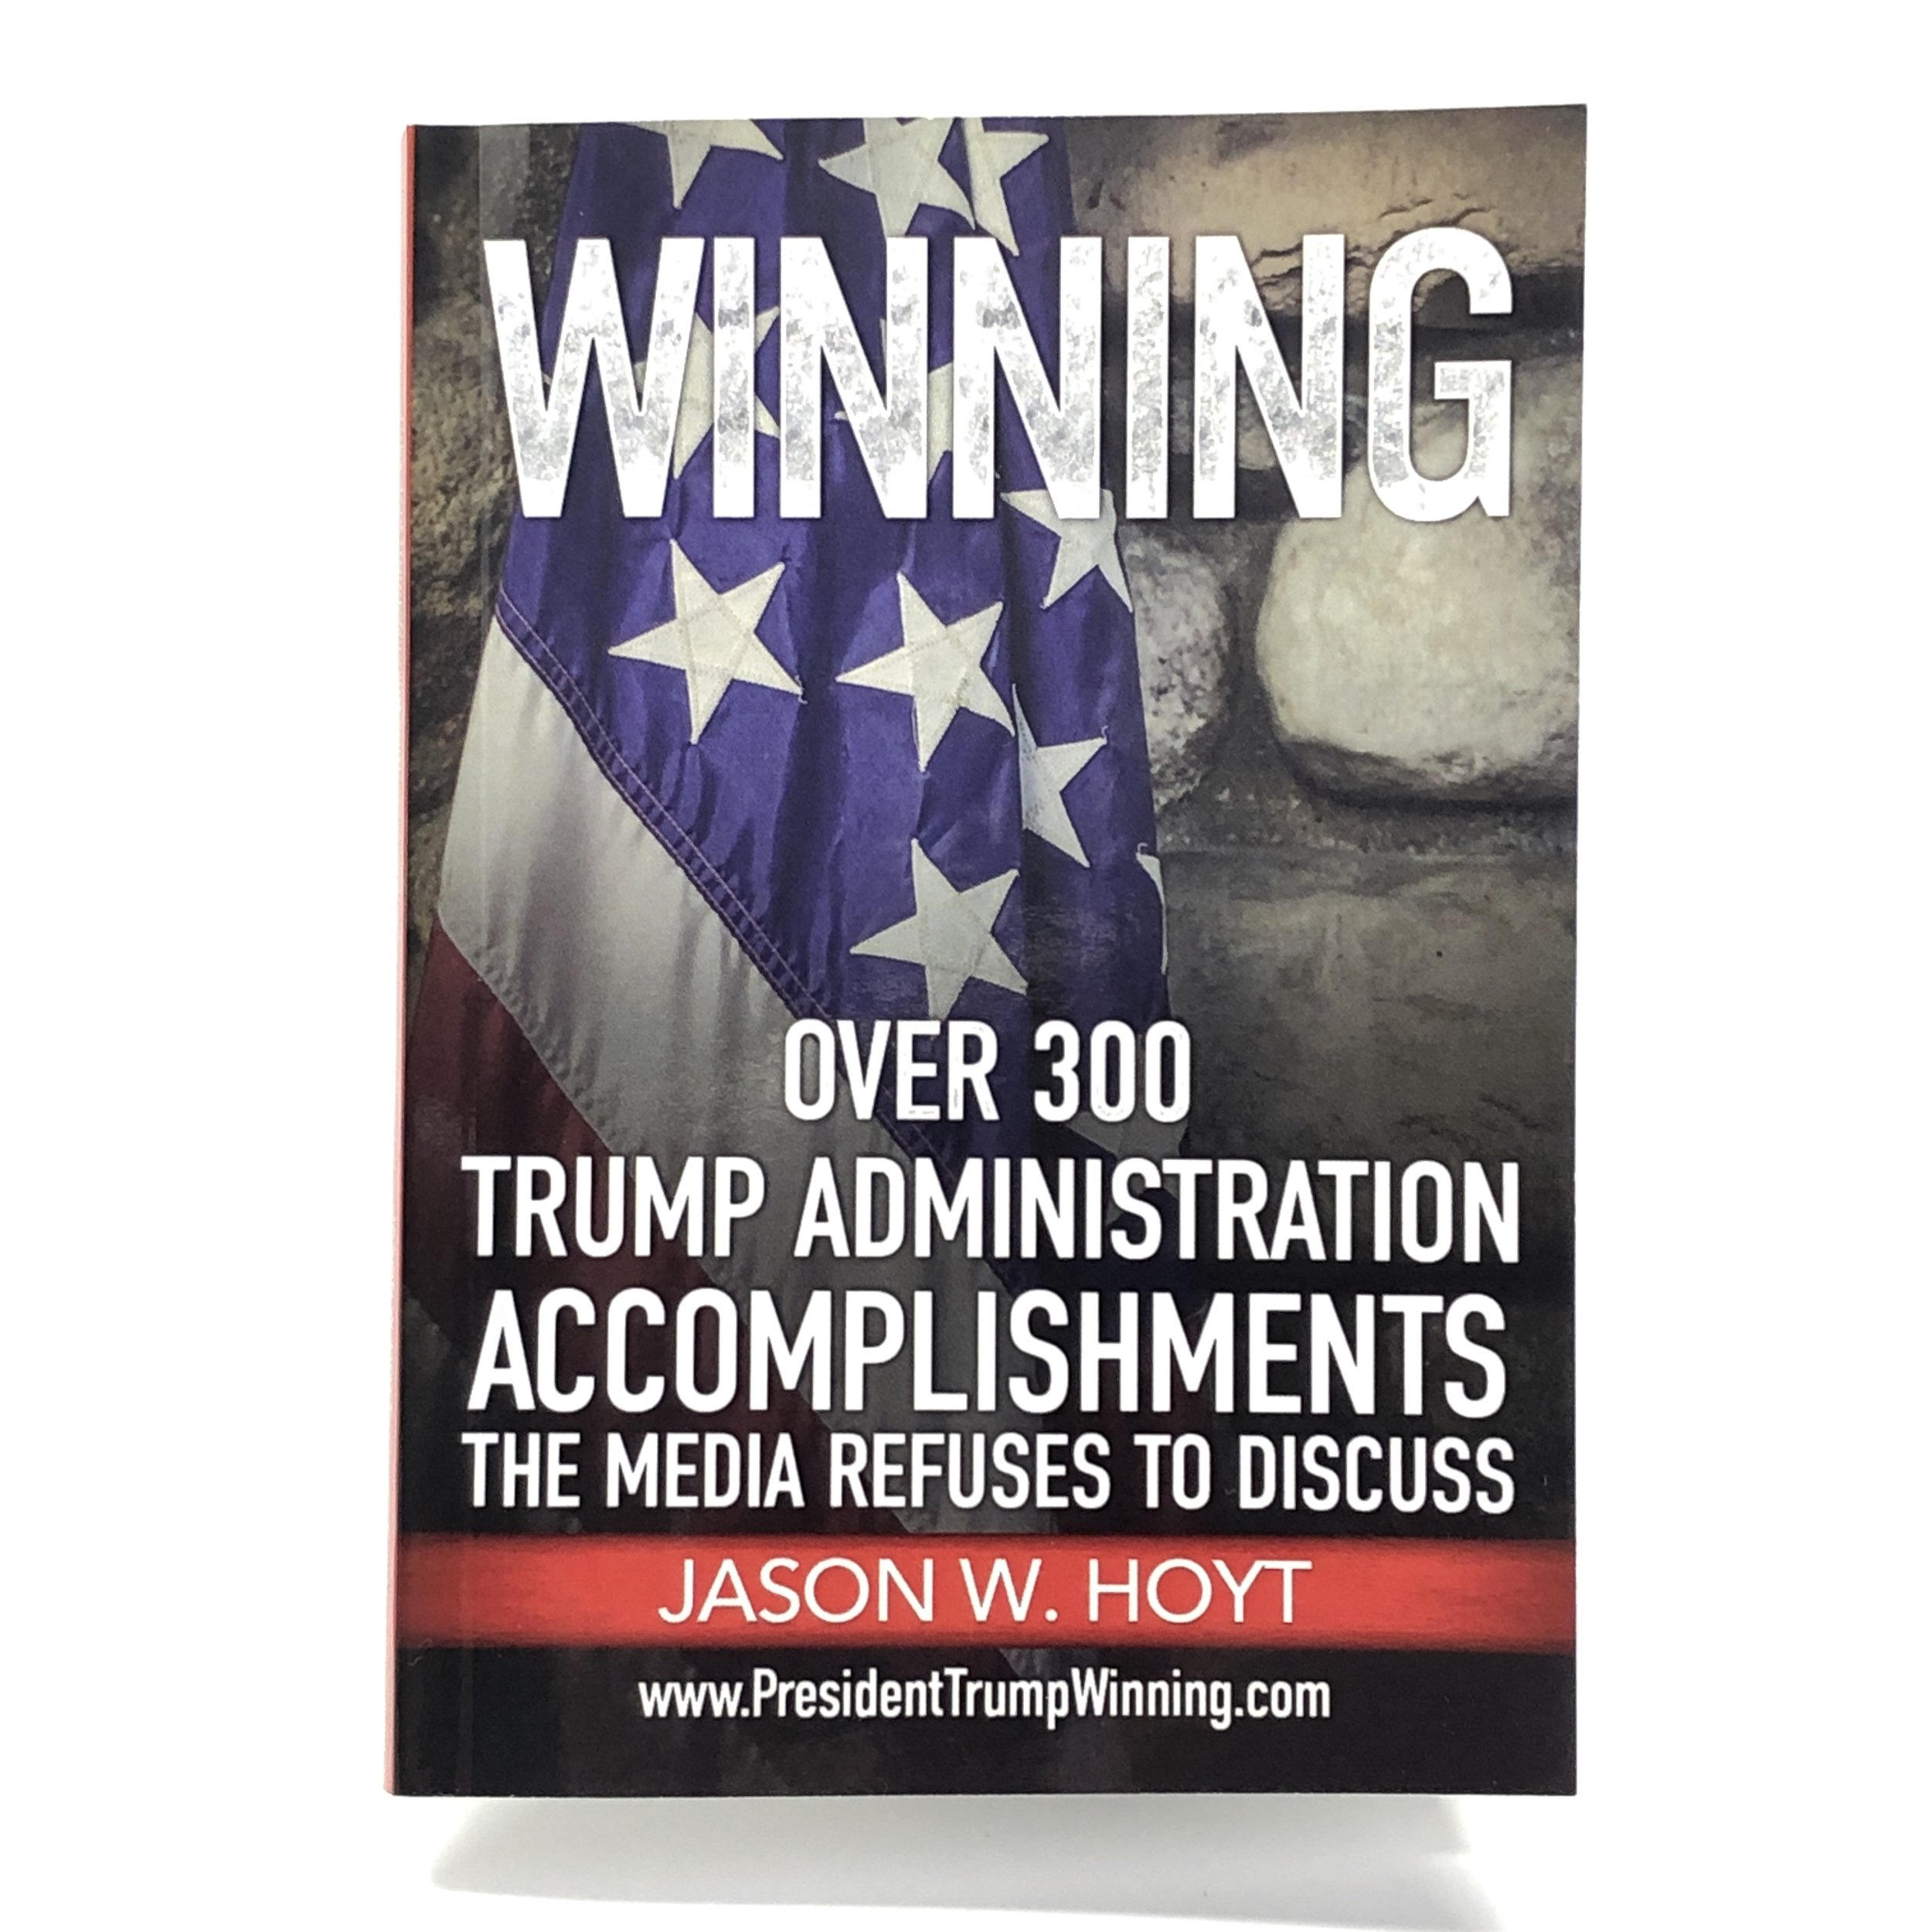 WINNING - 1 book - Trump Administration List of Accomplishments Jason W Hoyt.jpg